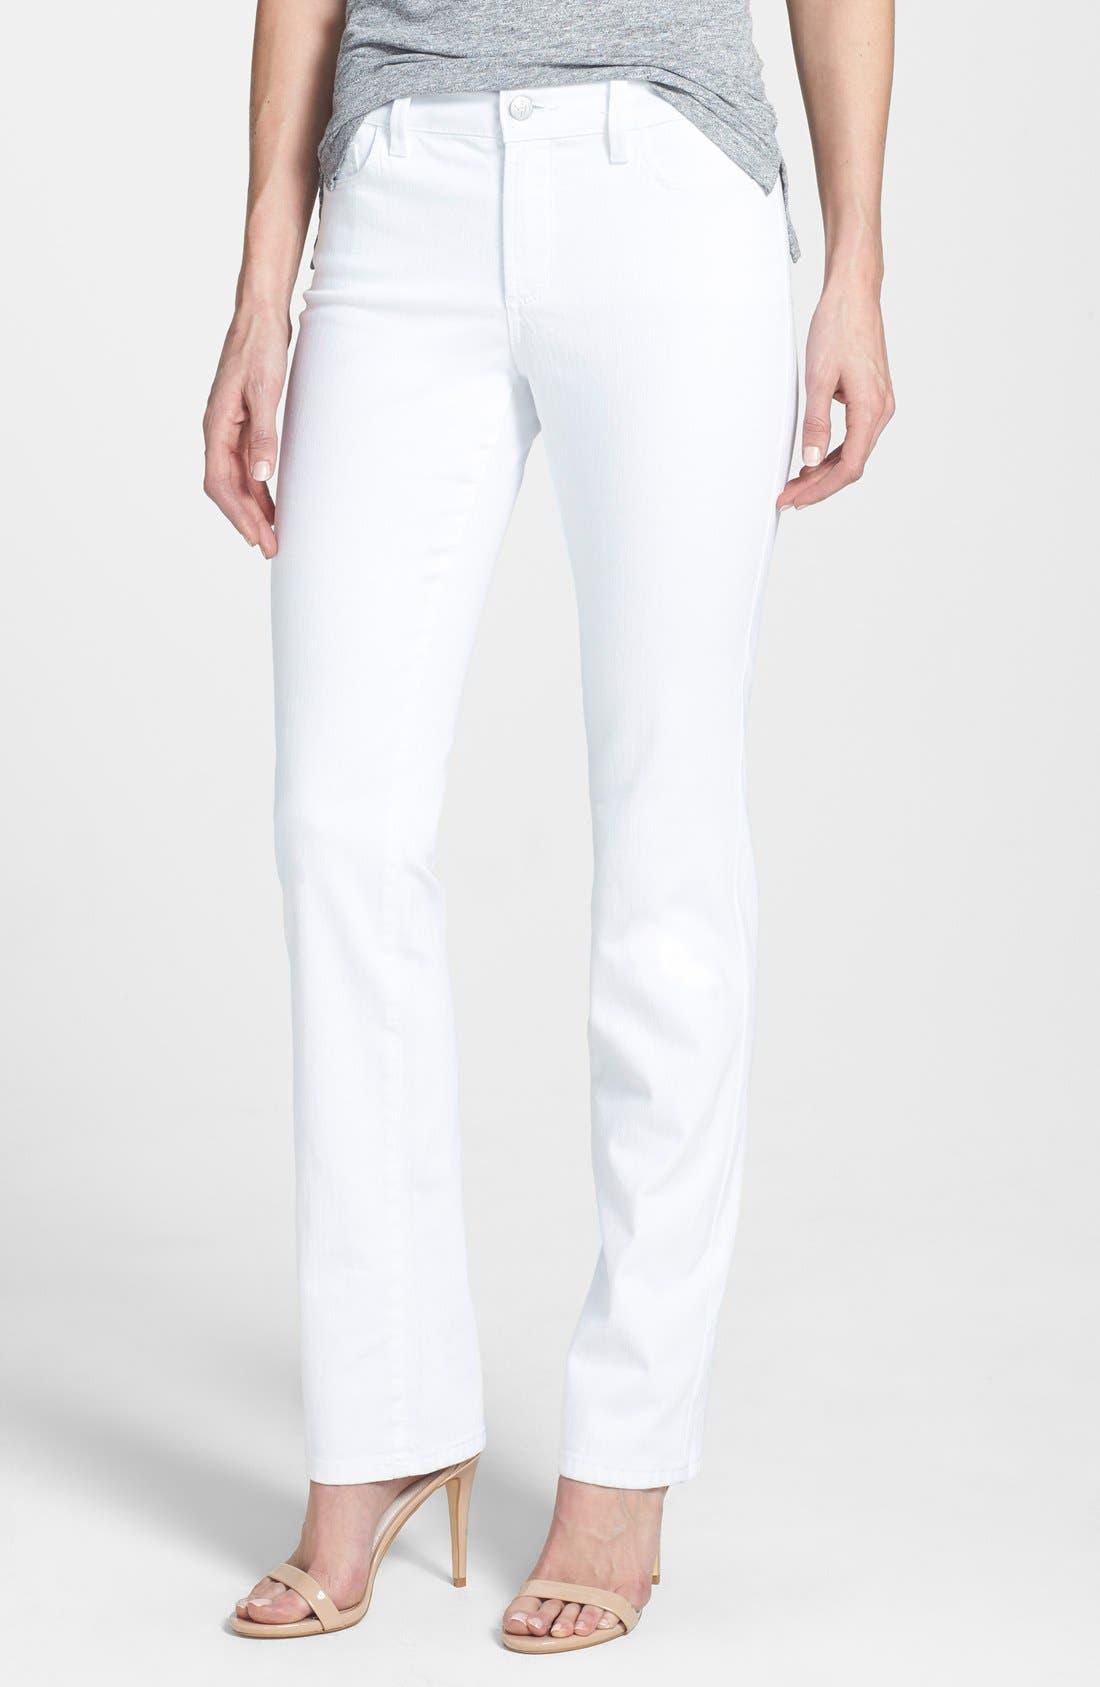 Main Image - NYDJ 'Marilyn' Stretch Straight Leg Jeans (Optic White) (Regular & Petite)